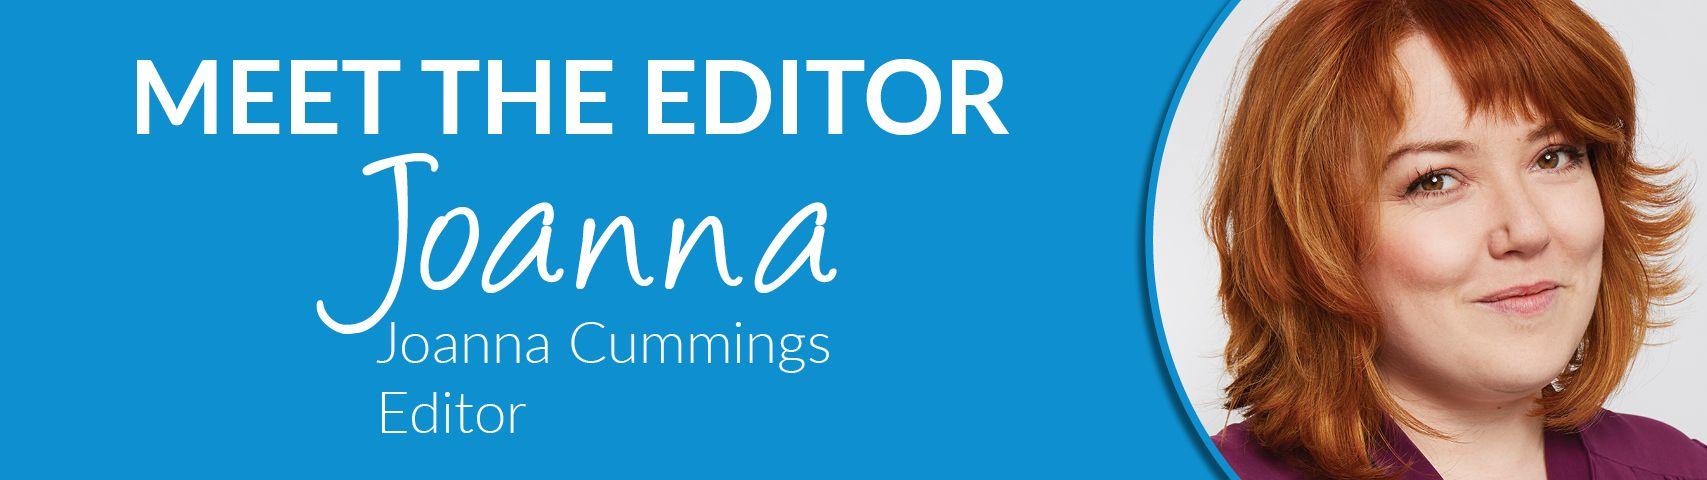 Meet-The-Editor-1